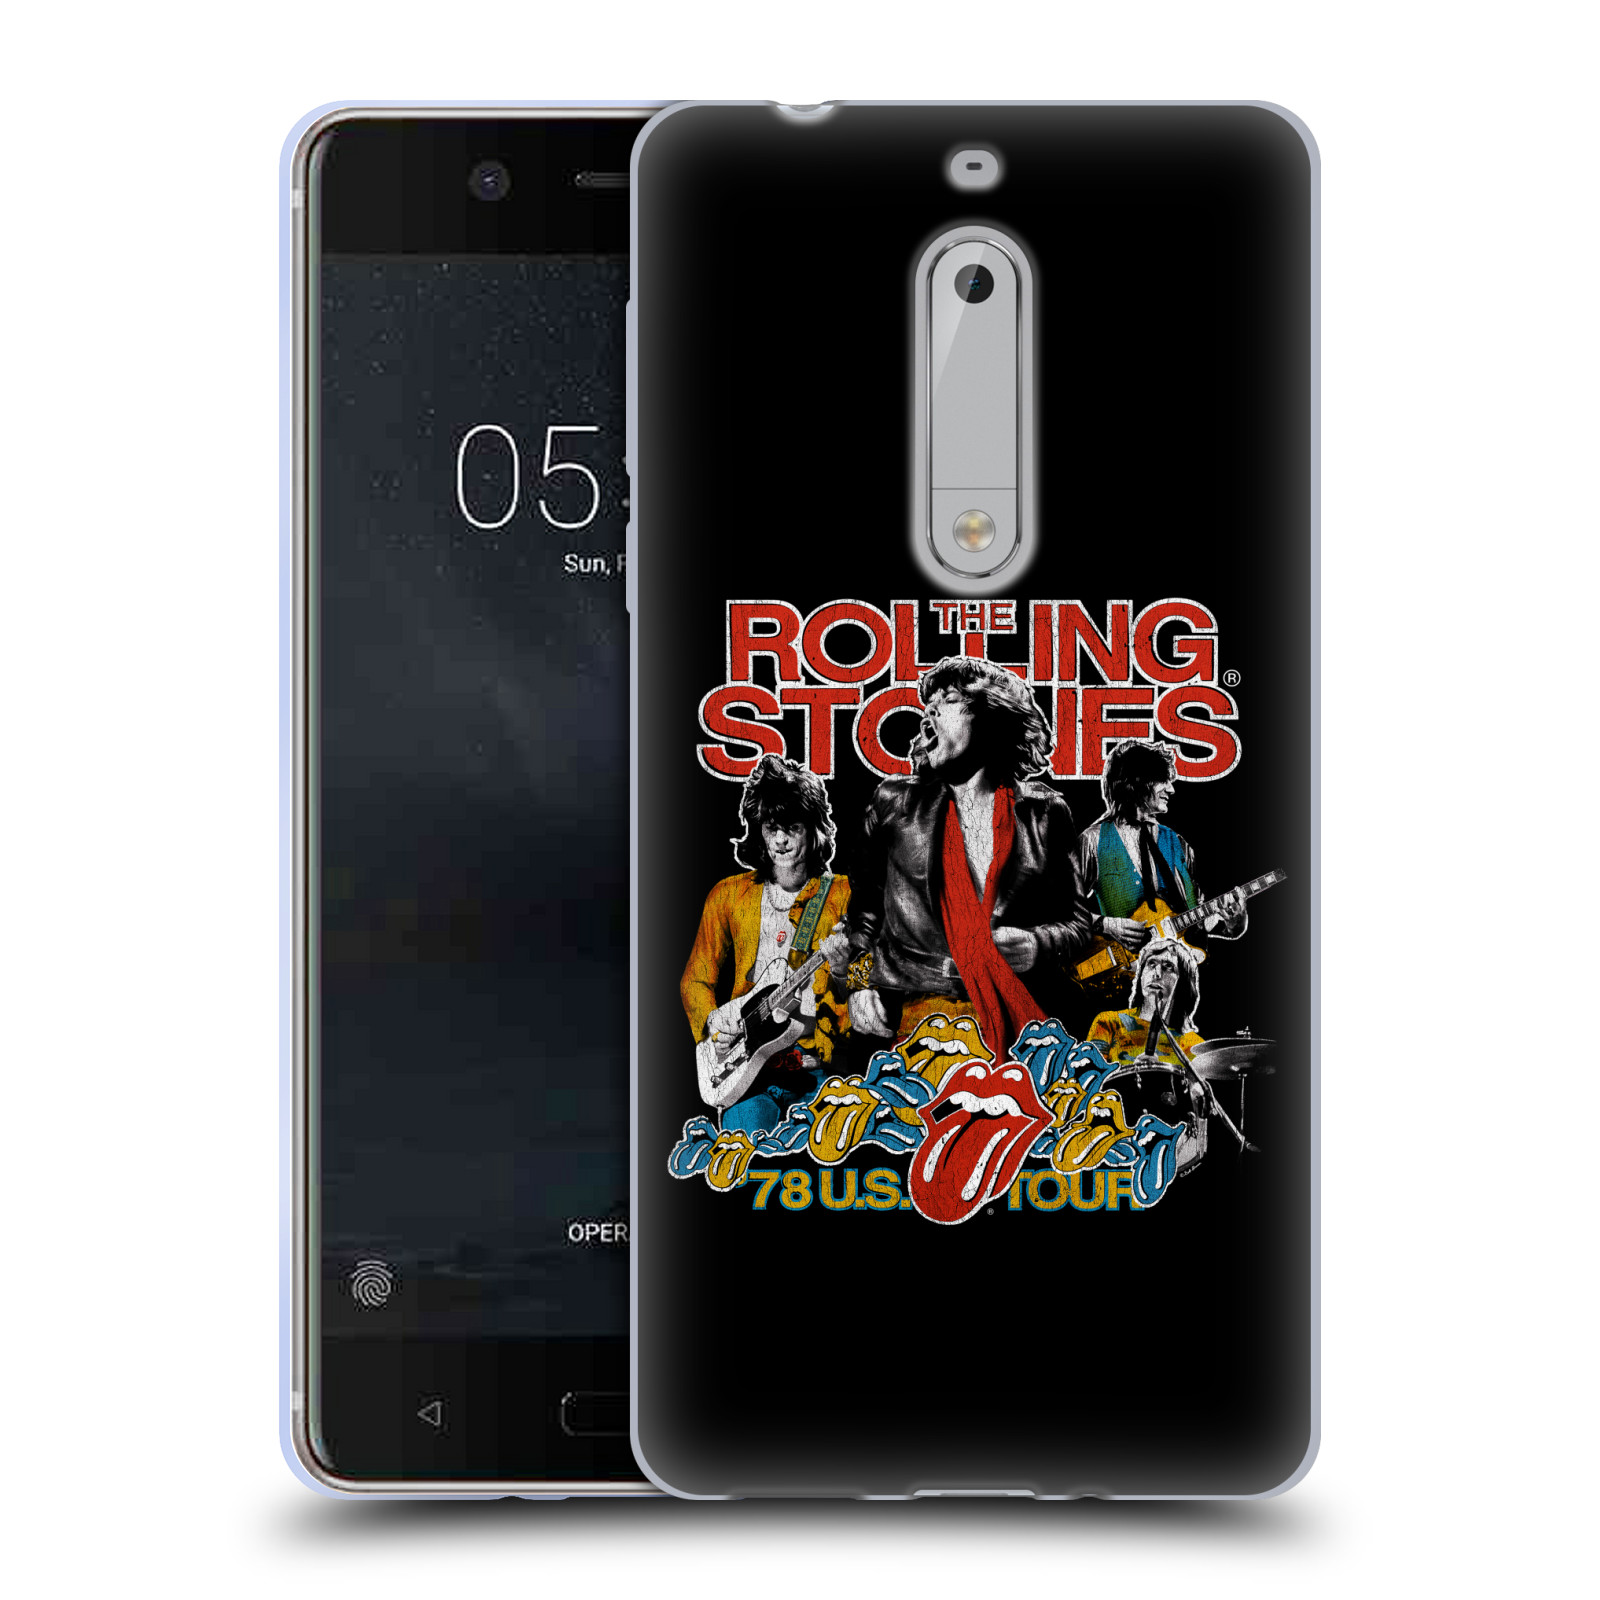 HEAD CASE silikonový obal na mobil Nokia 5 rocková skupina Rolling Stones barevný motiv